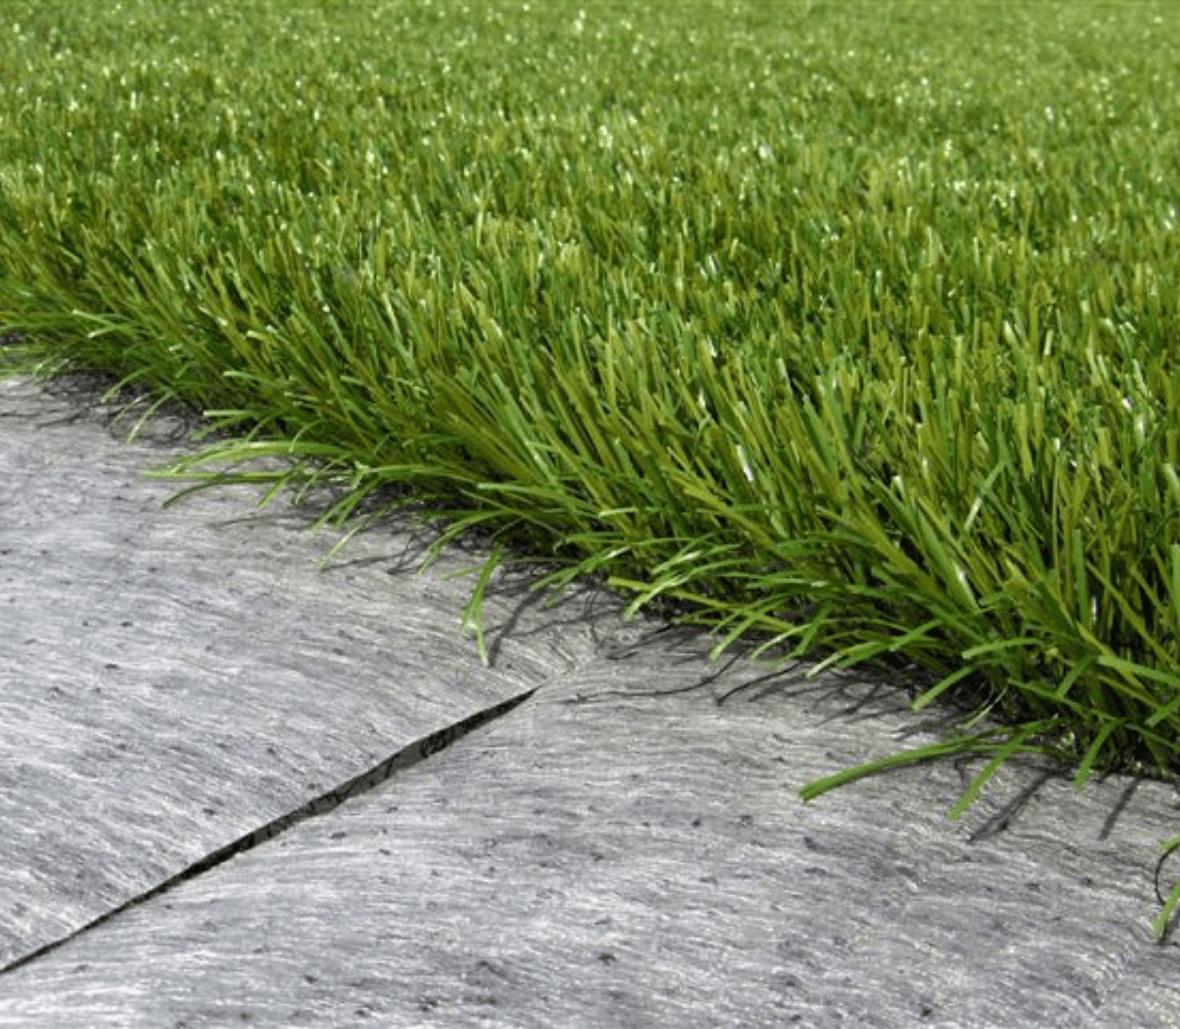 EnkaFlex_shockpad & drainage system for sportsfields_copyrights Low & Bonar_Enka Solutions (5)